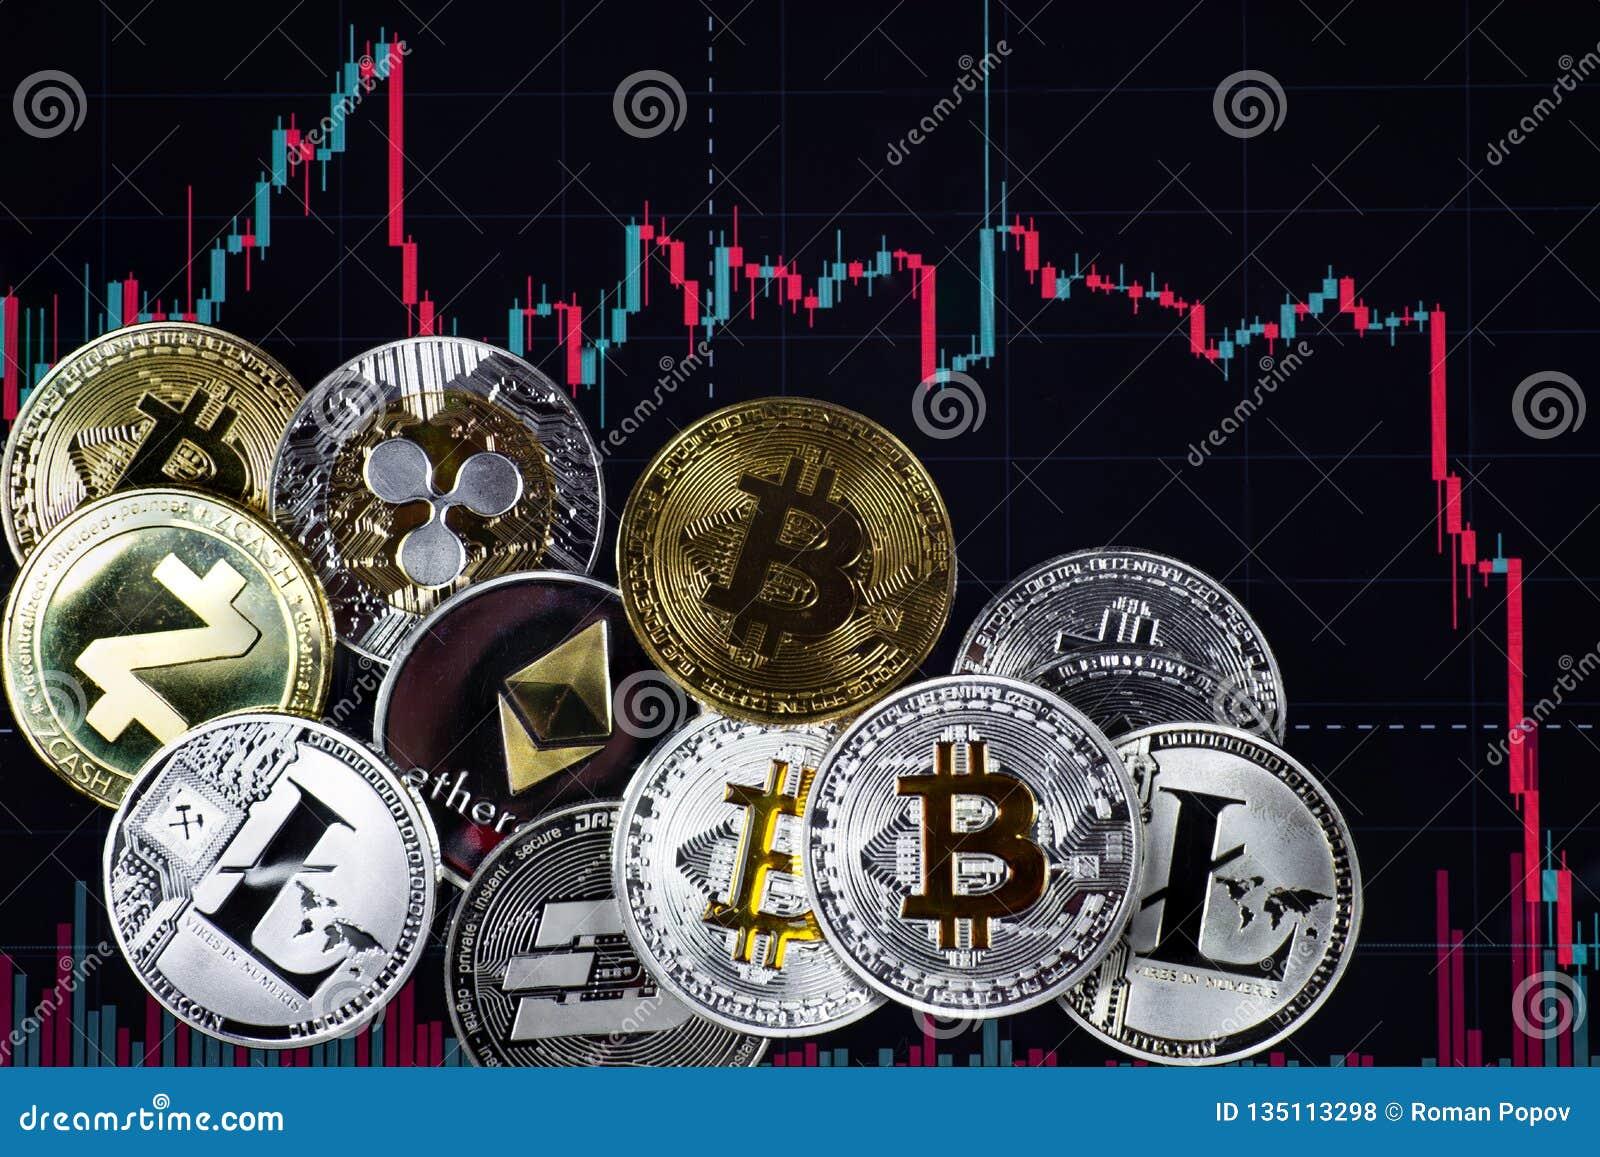 Etherium монеток, bitcoin, черточка, litecoin, пульсация, zcash на фоне падая диаграммы обменом